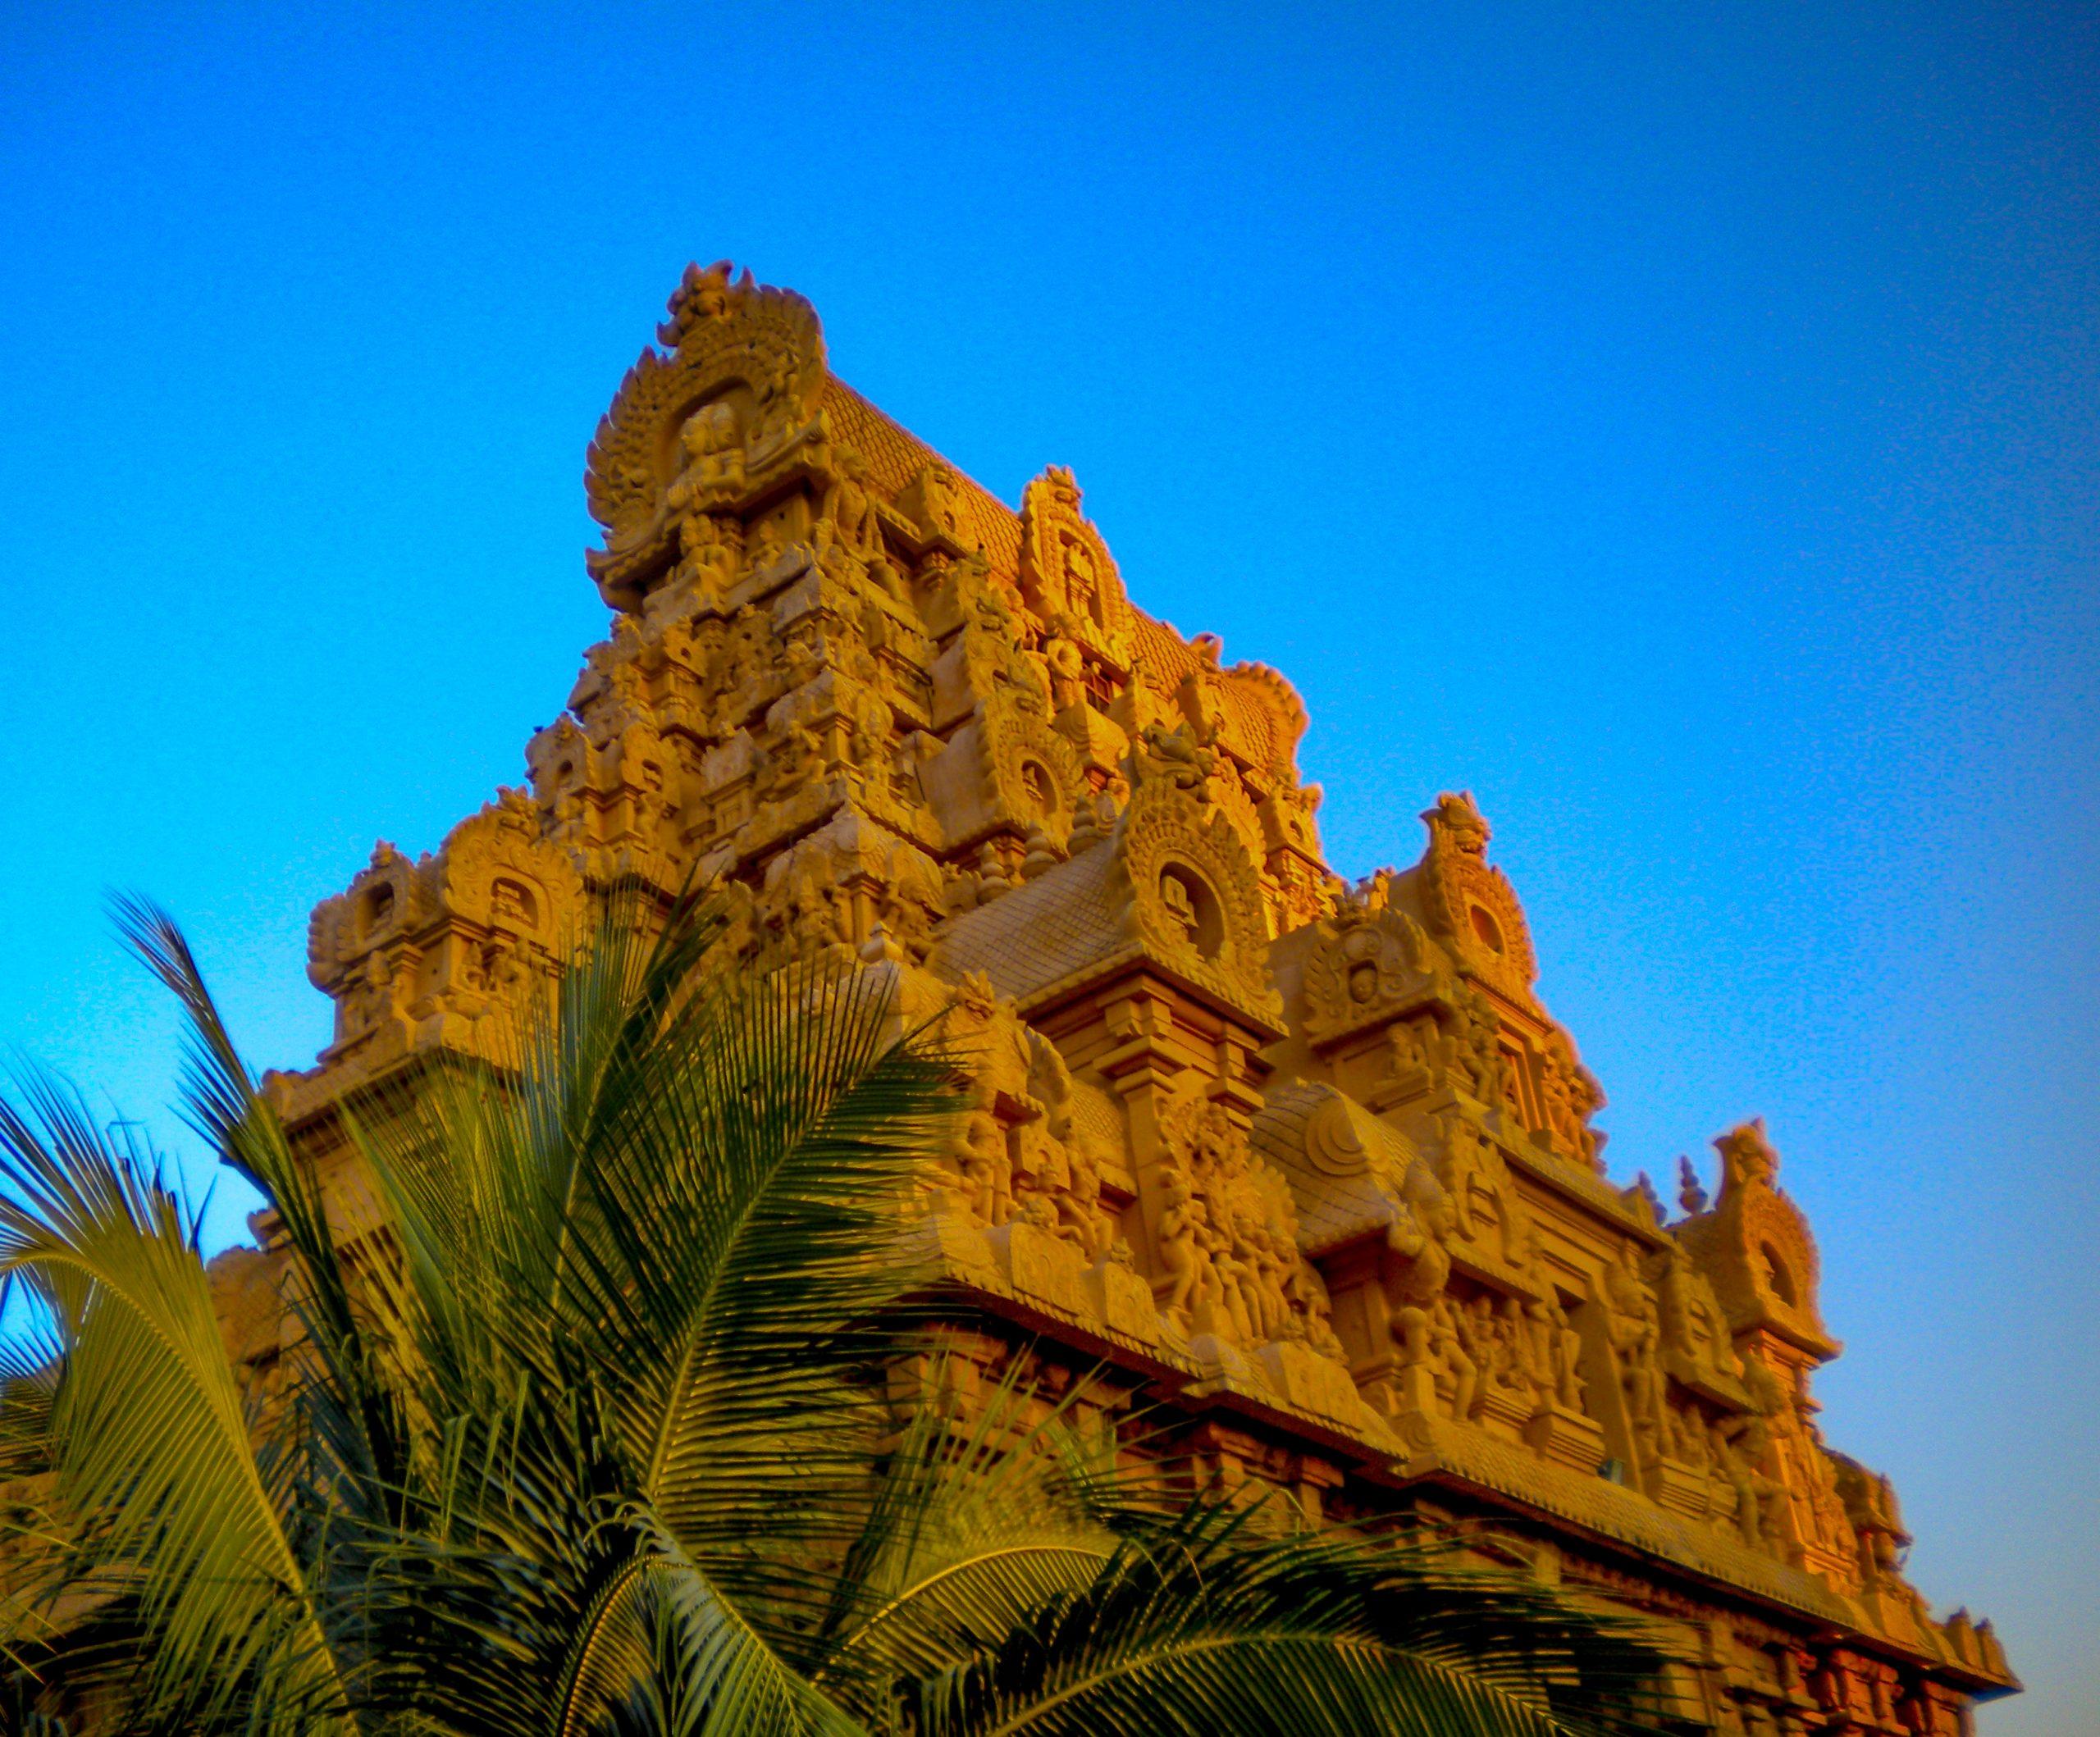 Brihadishvara Temple in Tamil Nadu, India